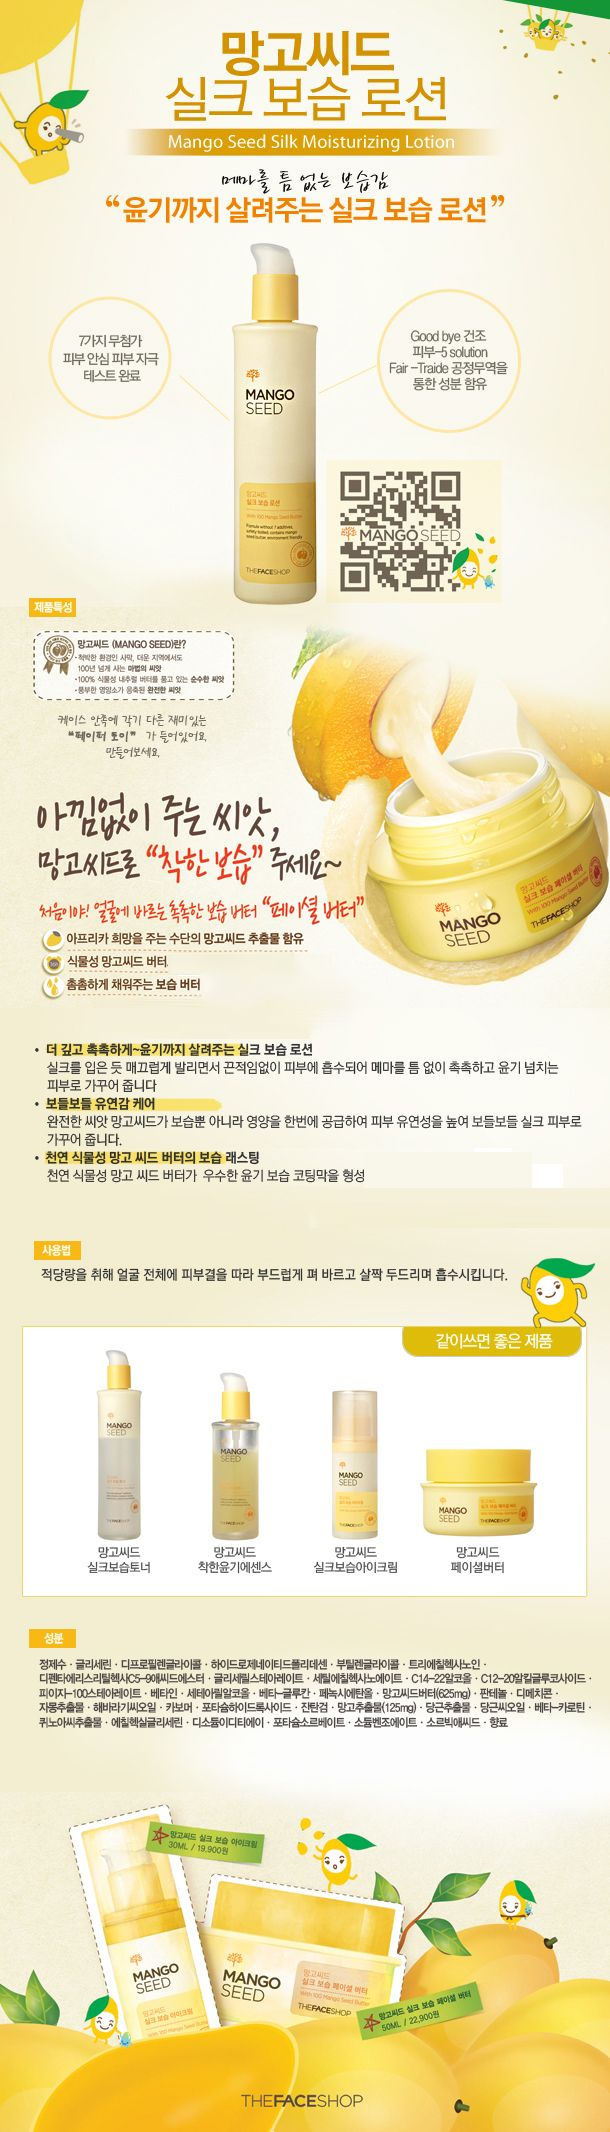 The FaceShop - Mango Seed Silk Moisturizing Lotion